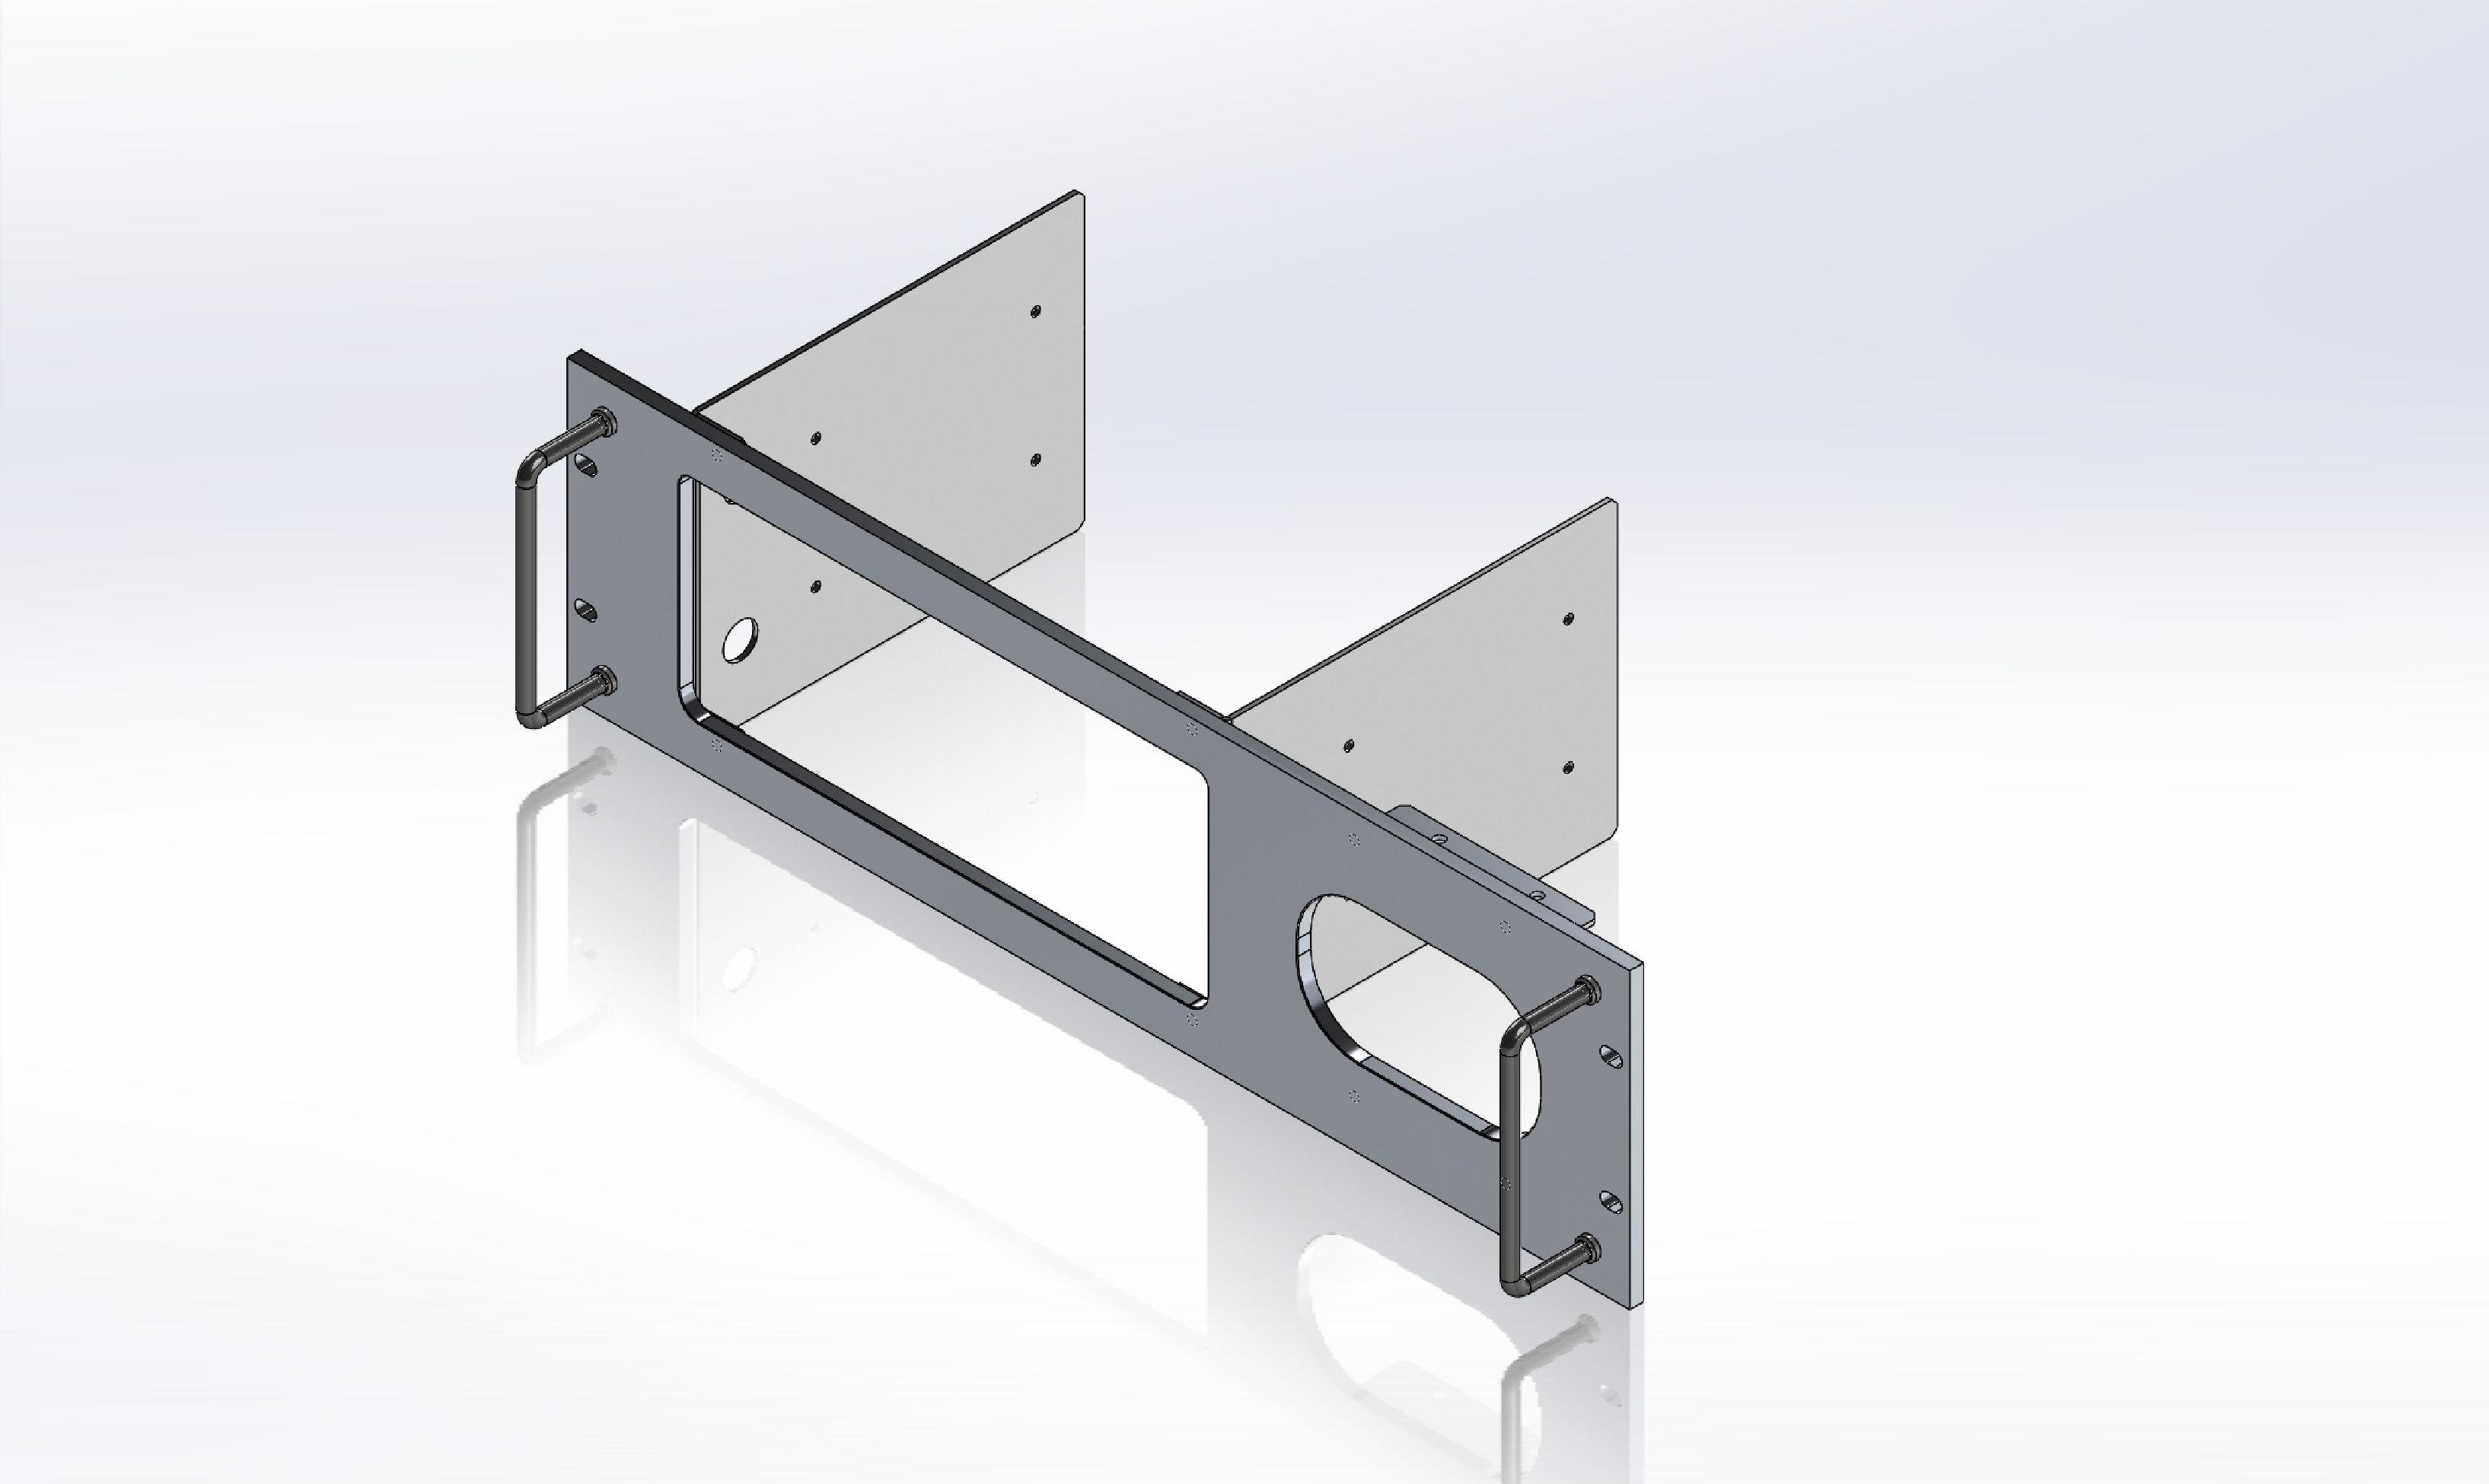 Rack Mount Panel for ICOM 7300/9700 | SNS Engineering